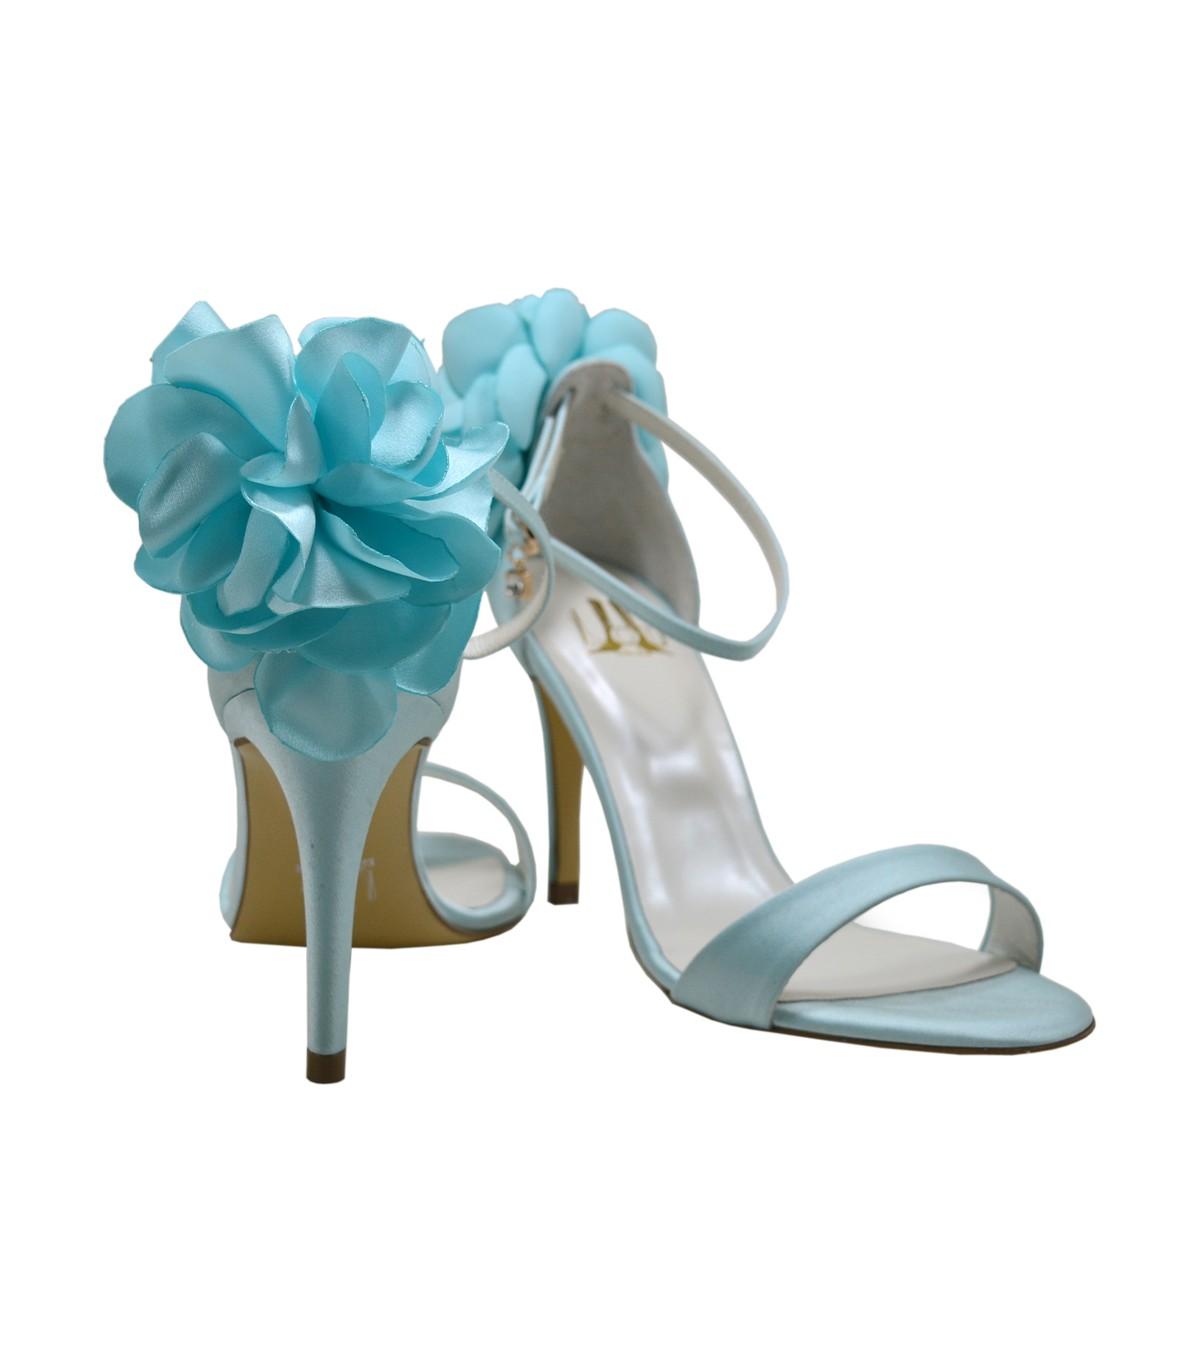 Lou bridal pumps Peony